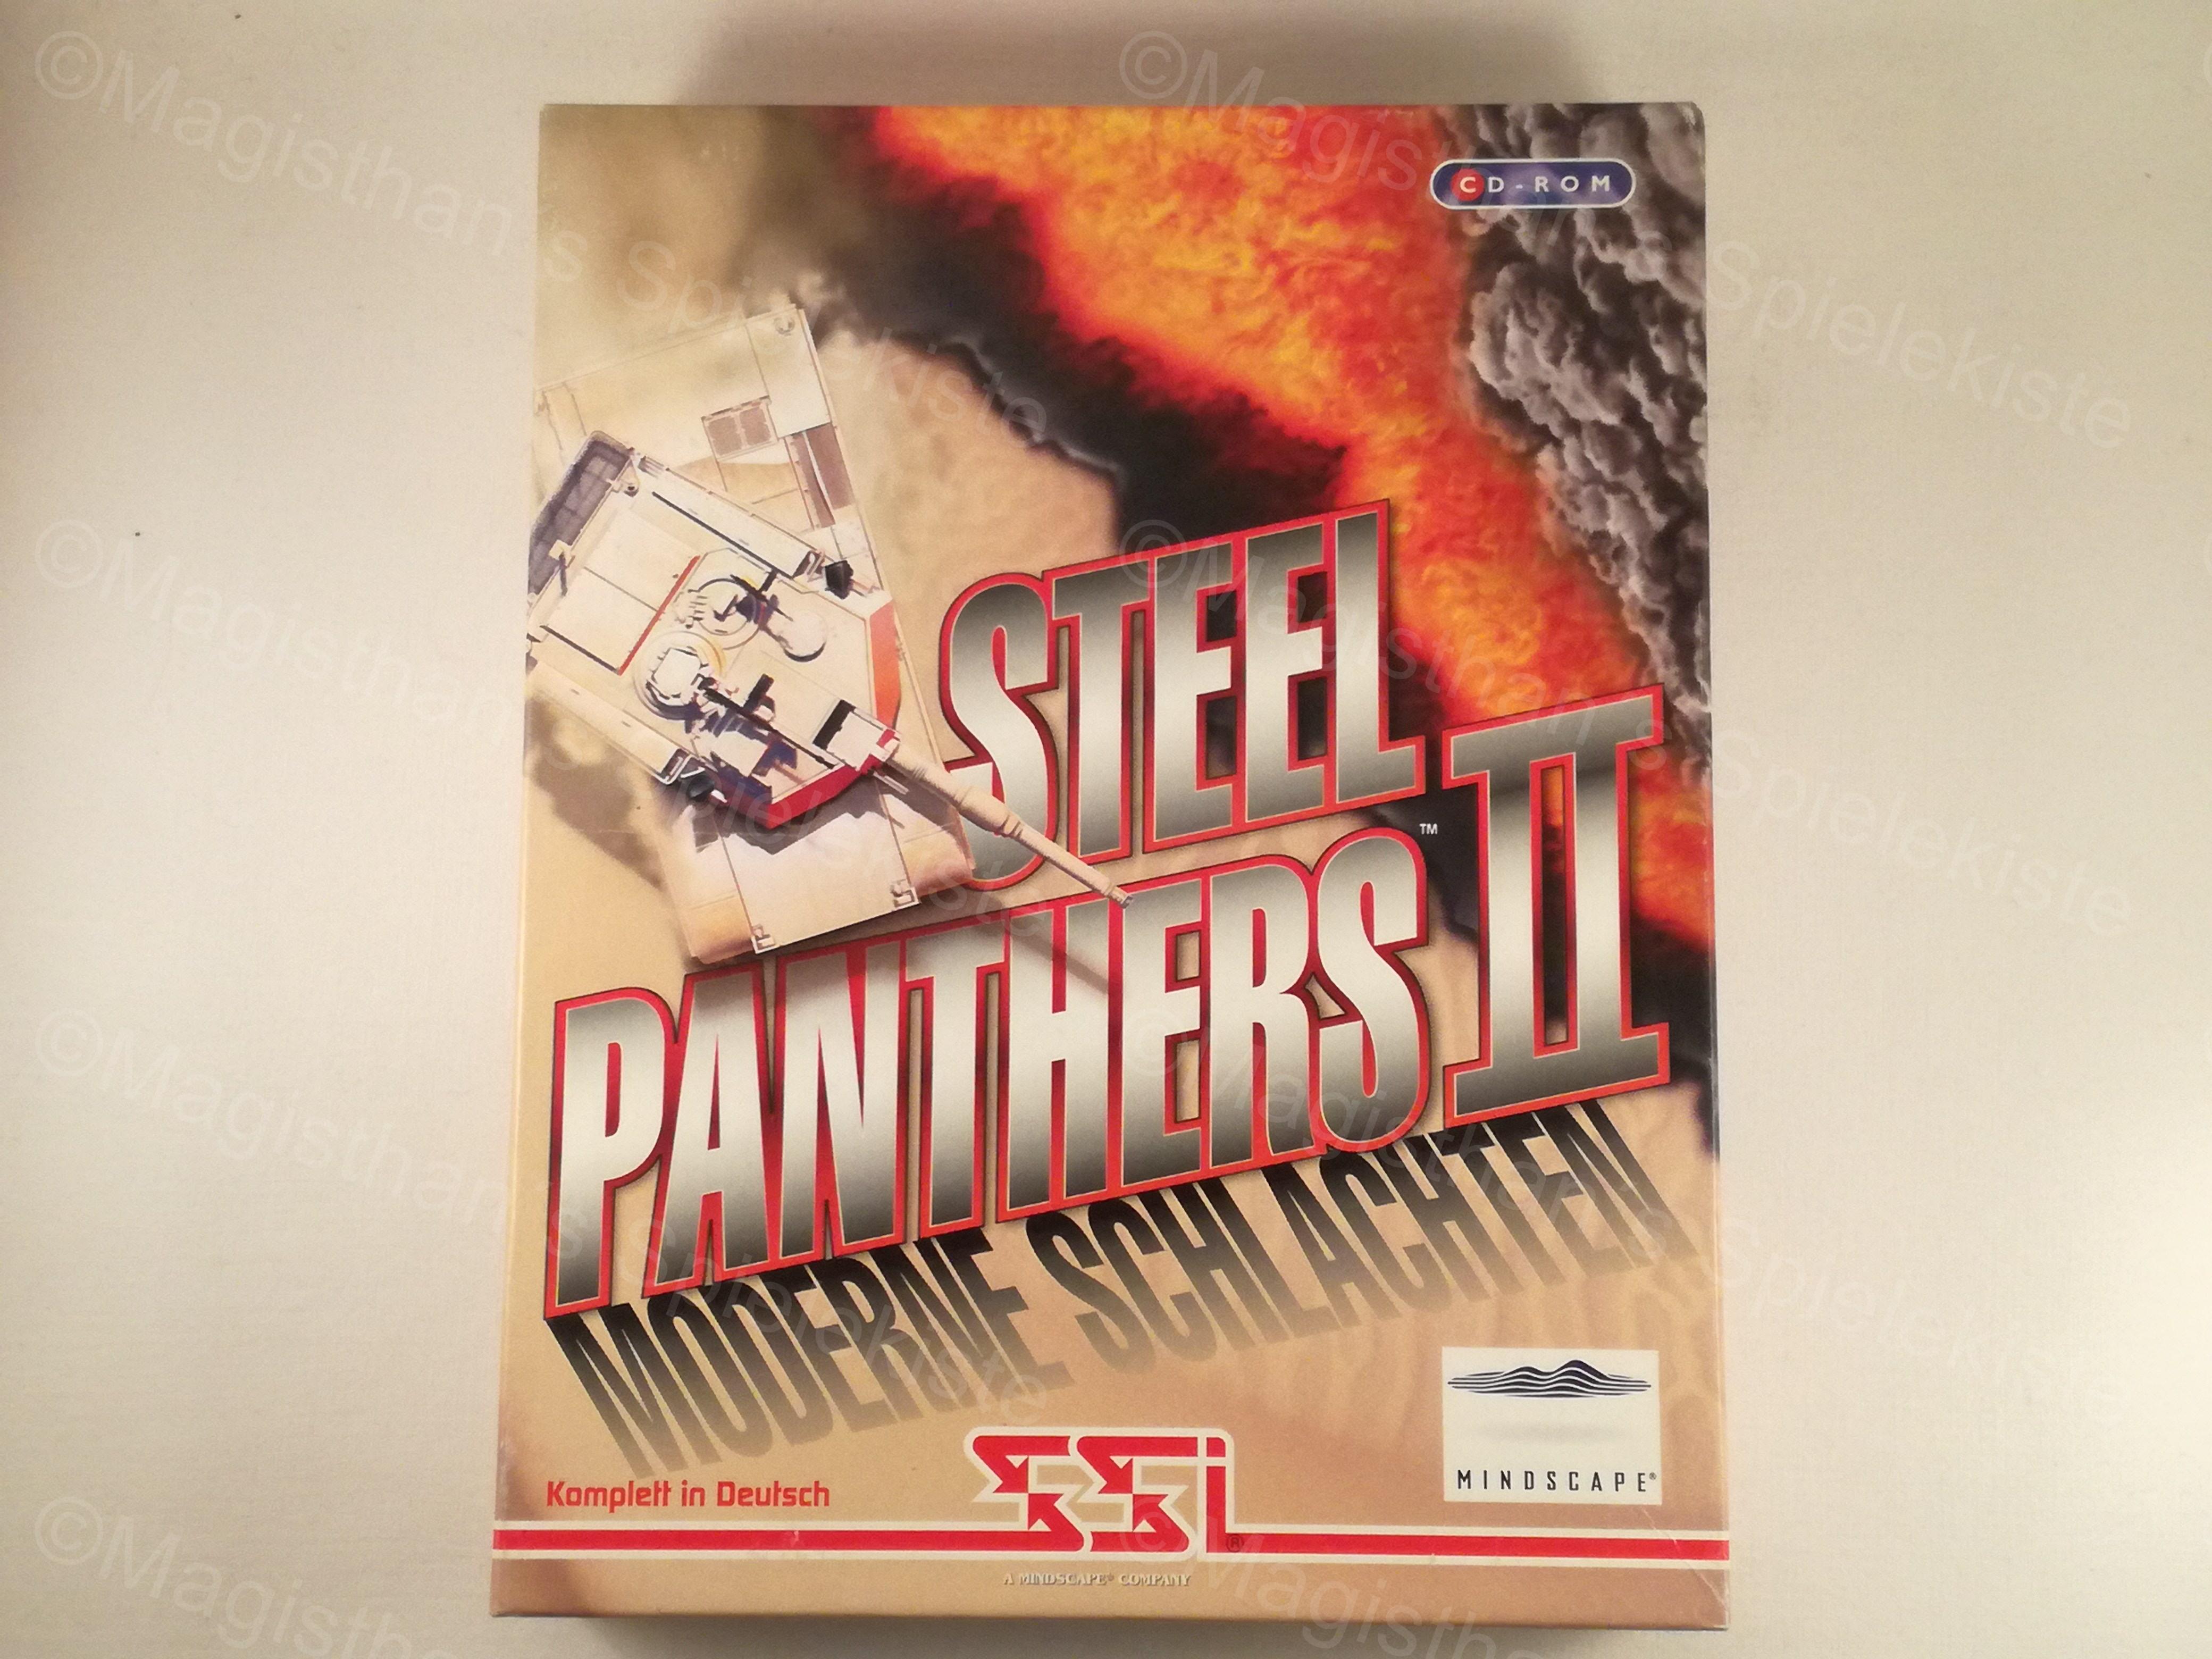 SteelPanthers21.jpg